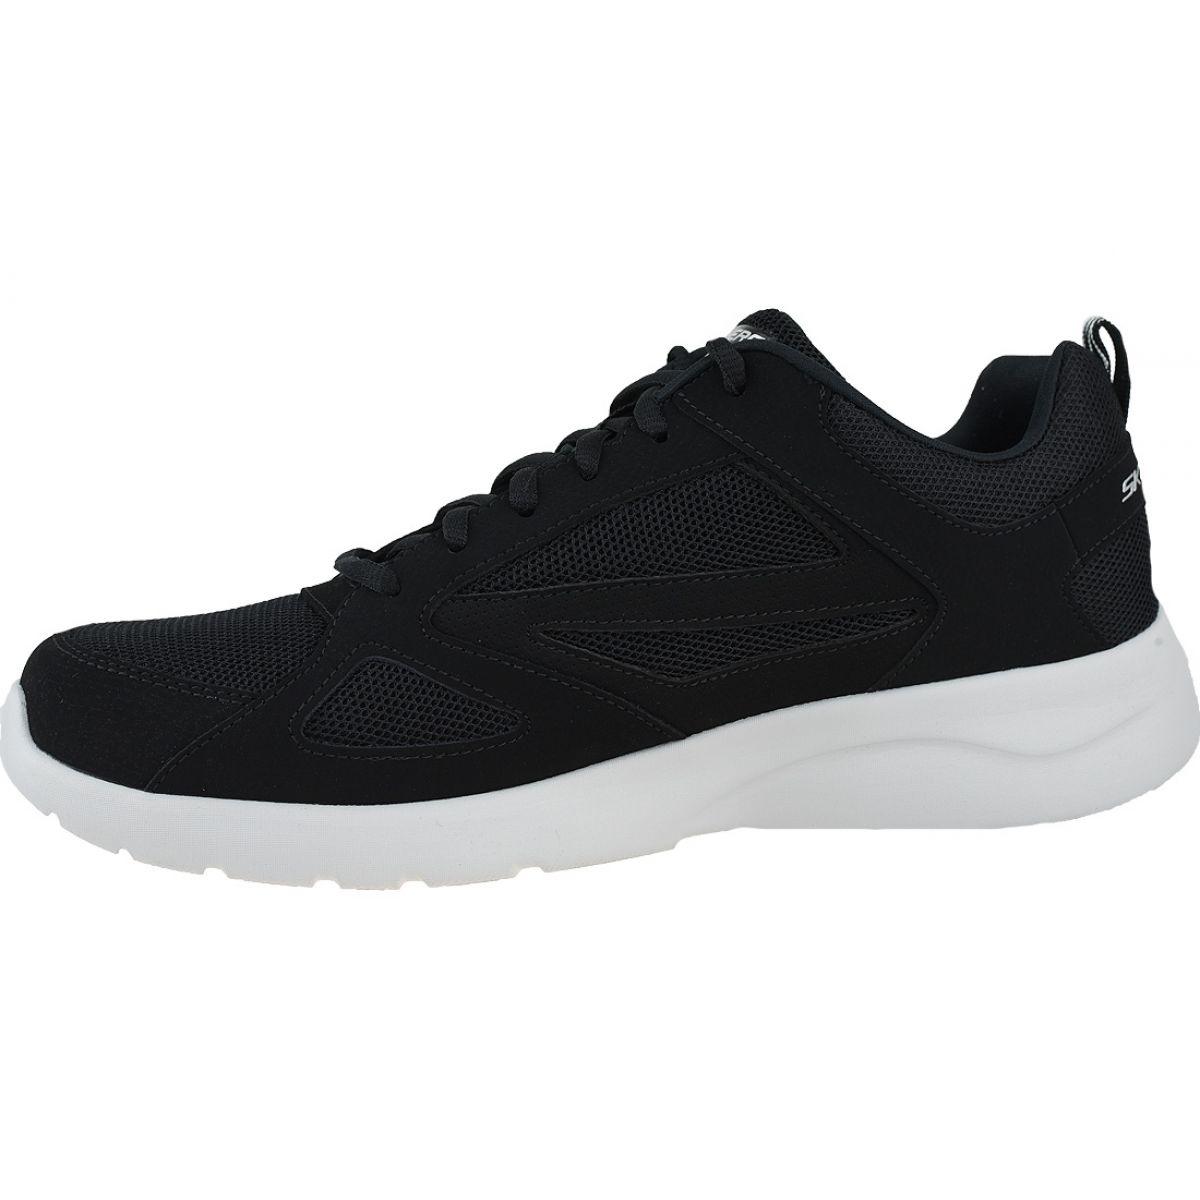 M SKECHERS 58363//BBK DYNAMIGHT 2.0 FALLFORD Mn´s Black Mesh Athletic Shoes